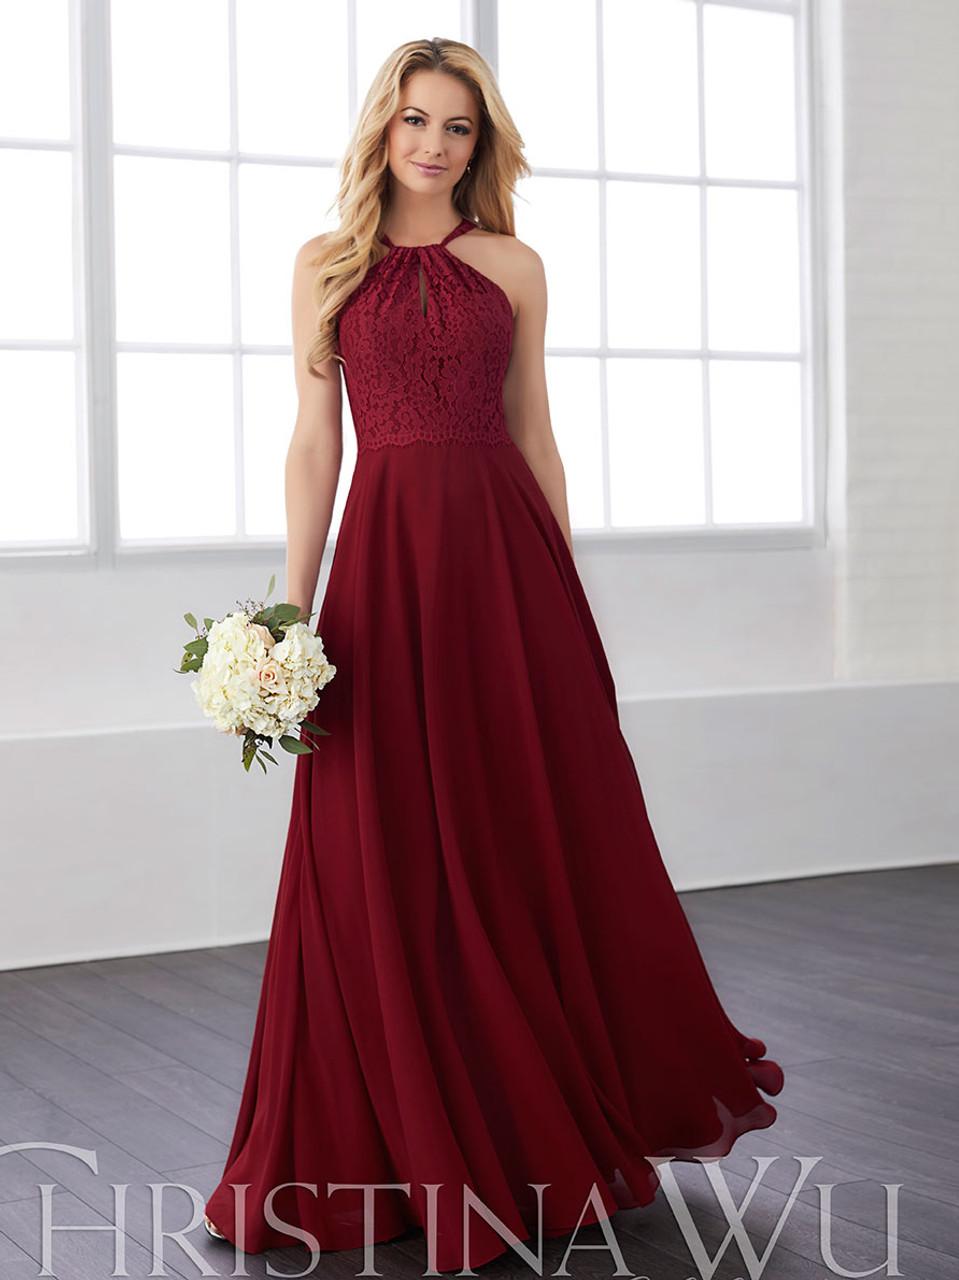 dc6fda49be4 Halter bridesmaid dress Christina Wu 22820